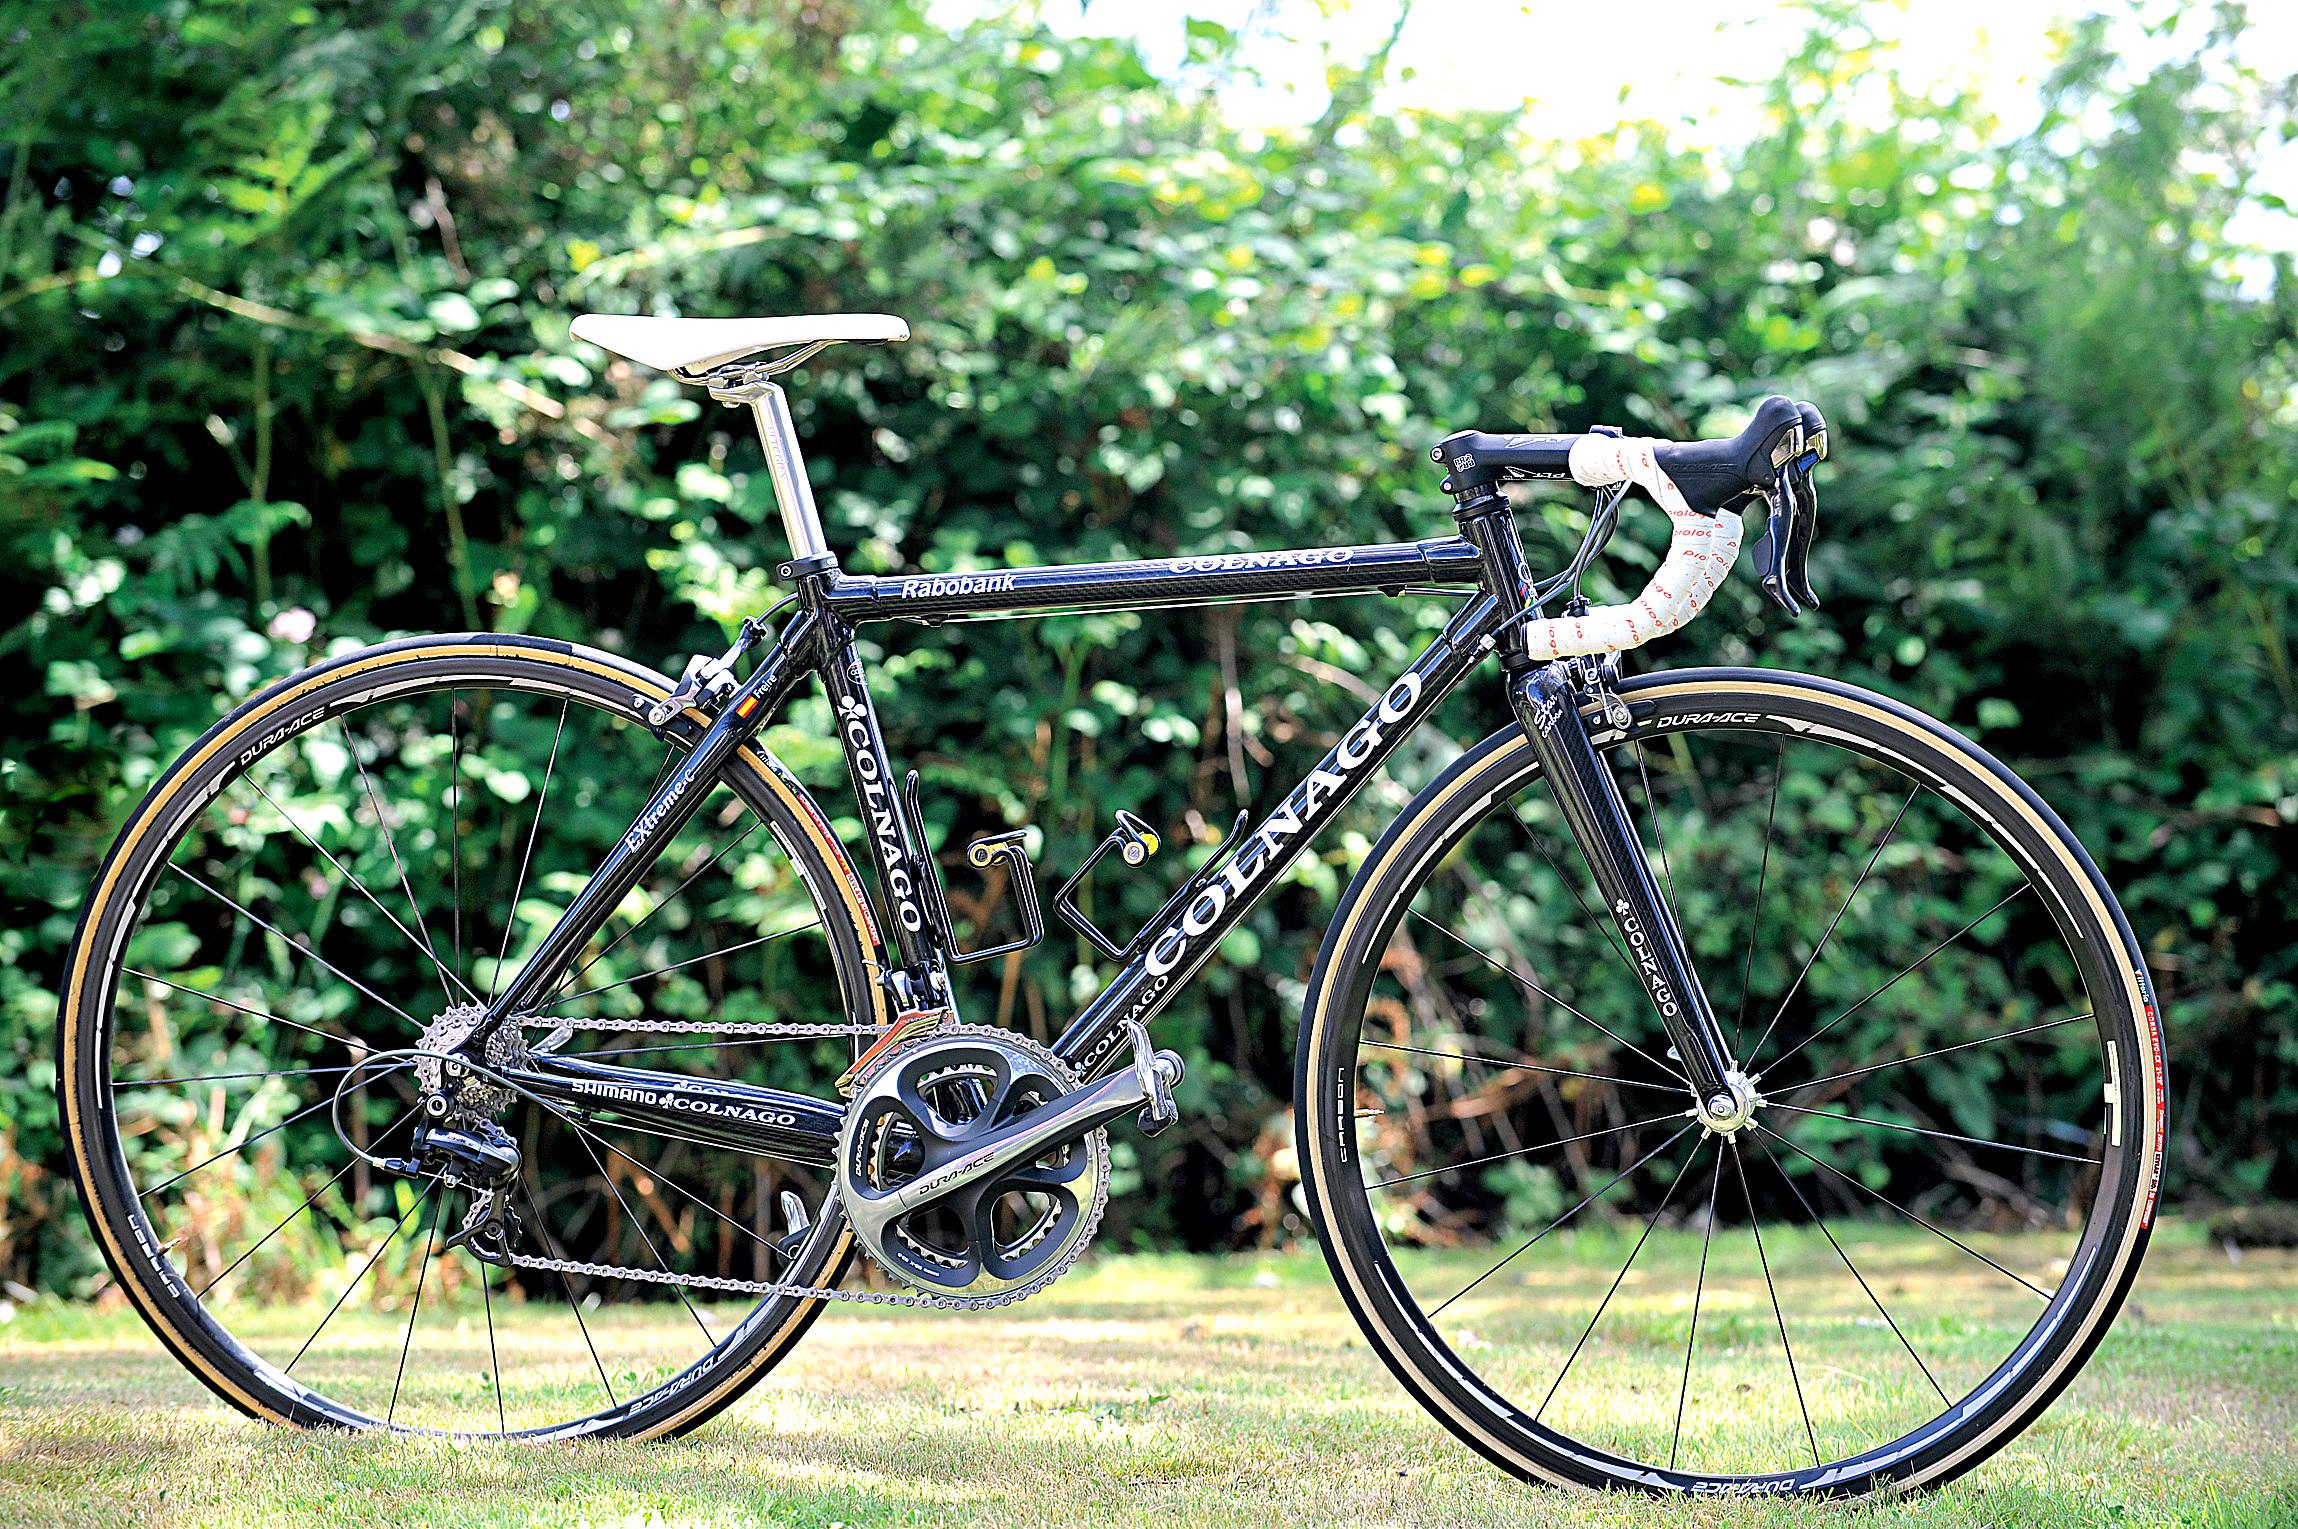 Oscar Frieres Colnago Extreme C bike